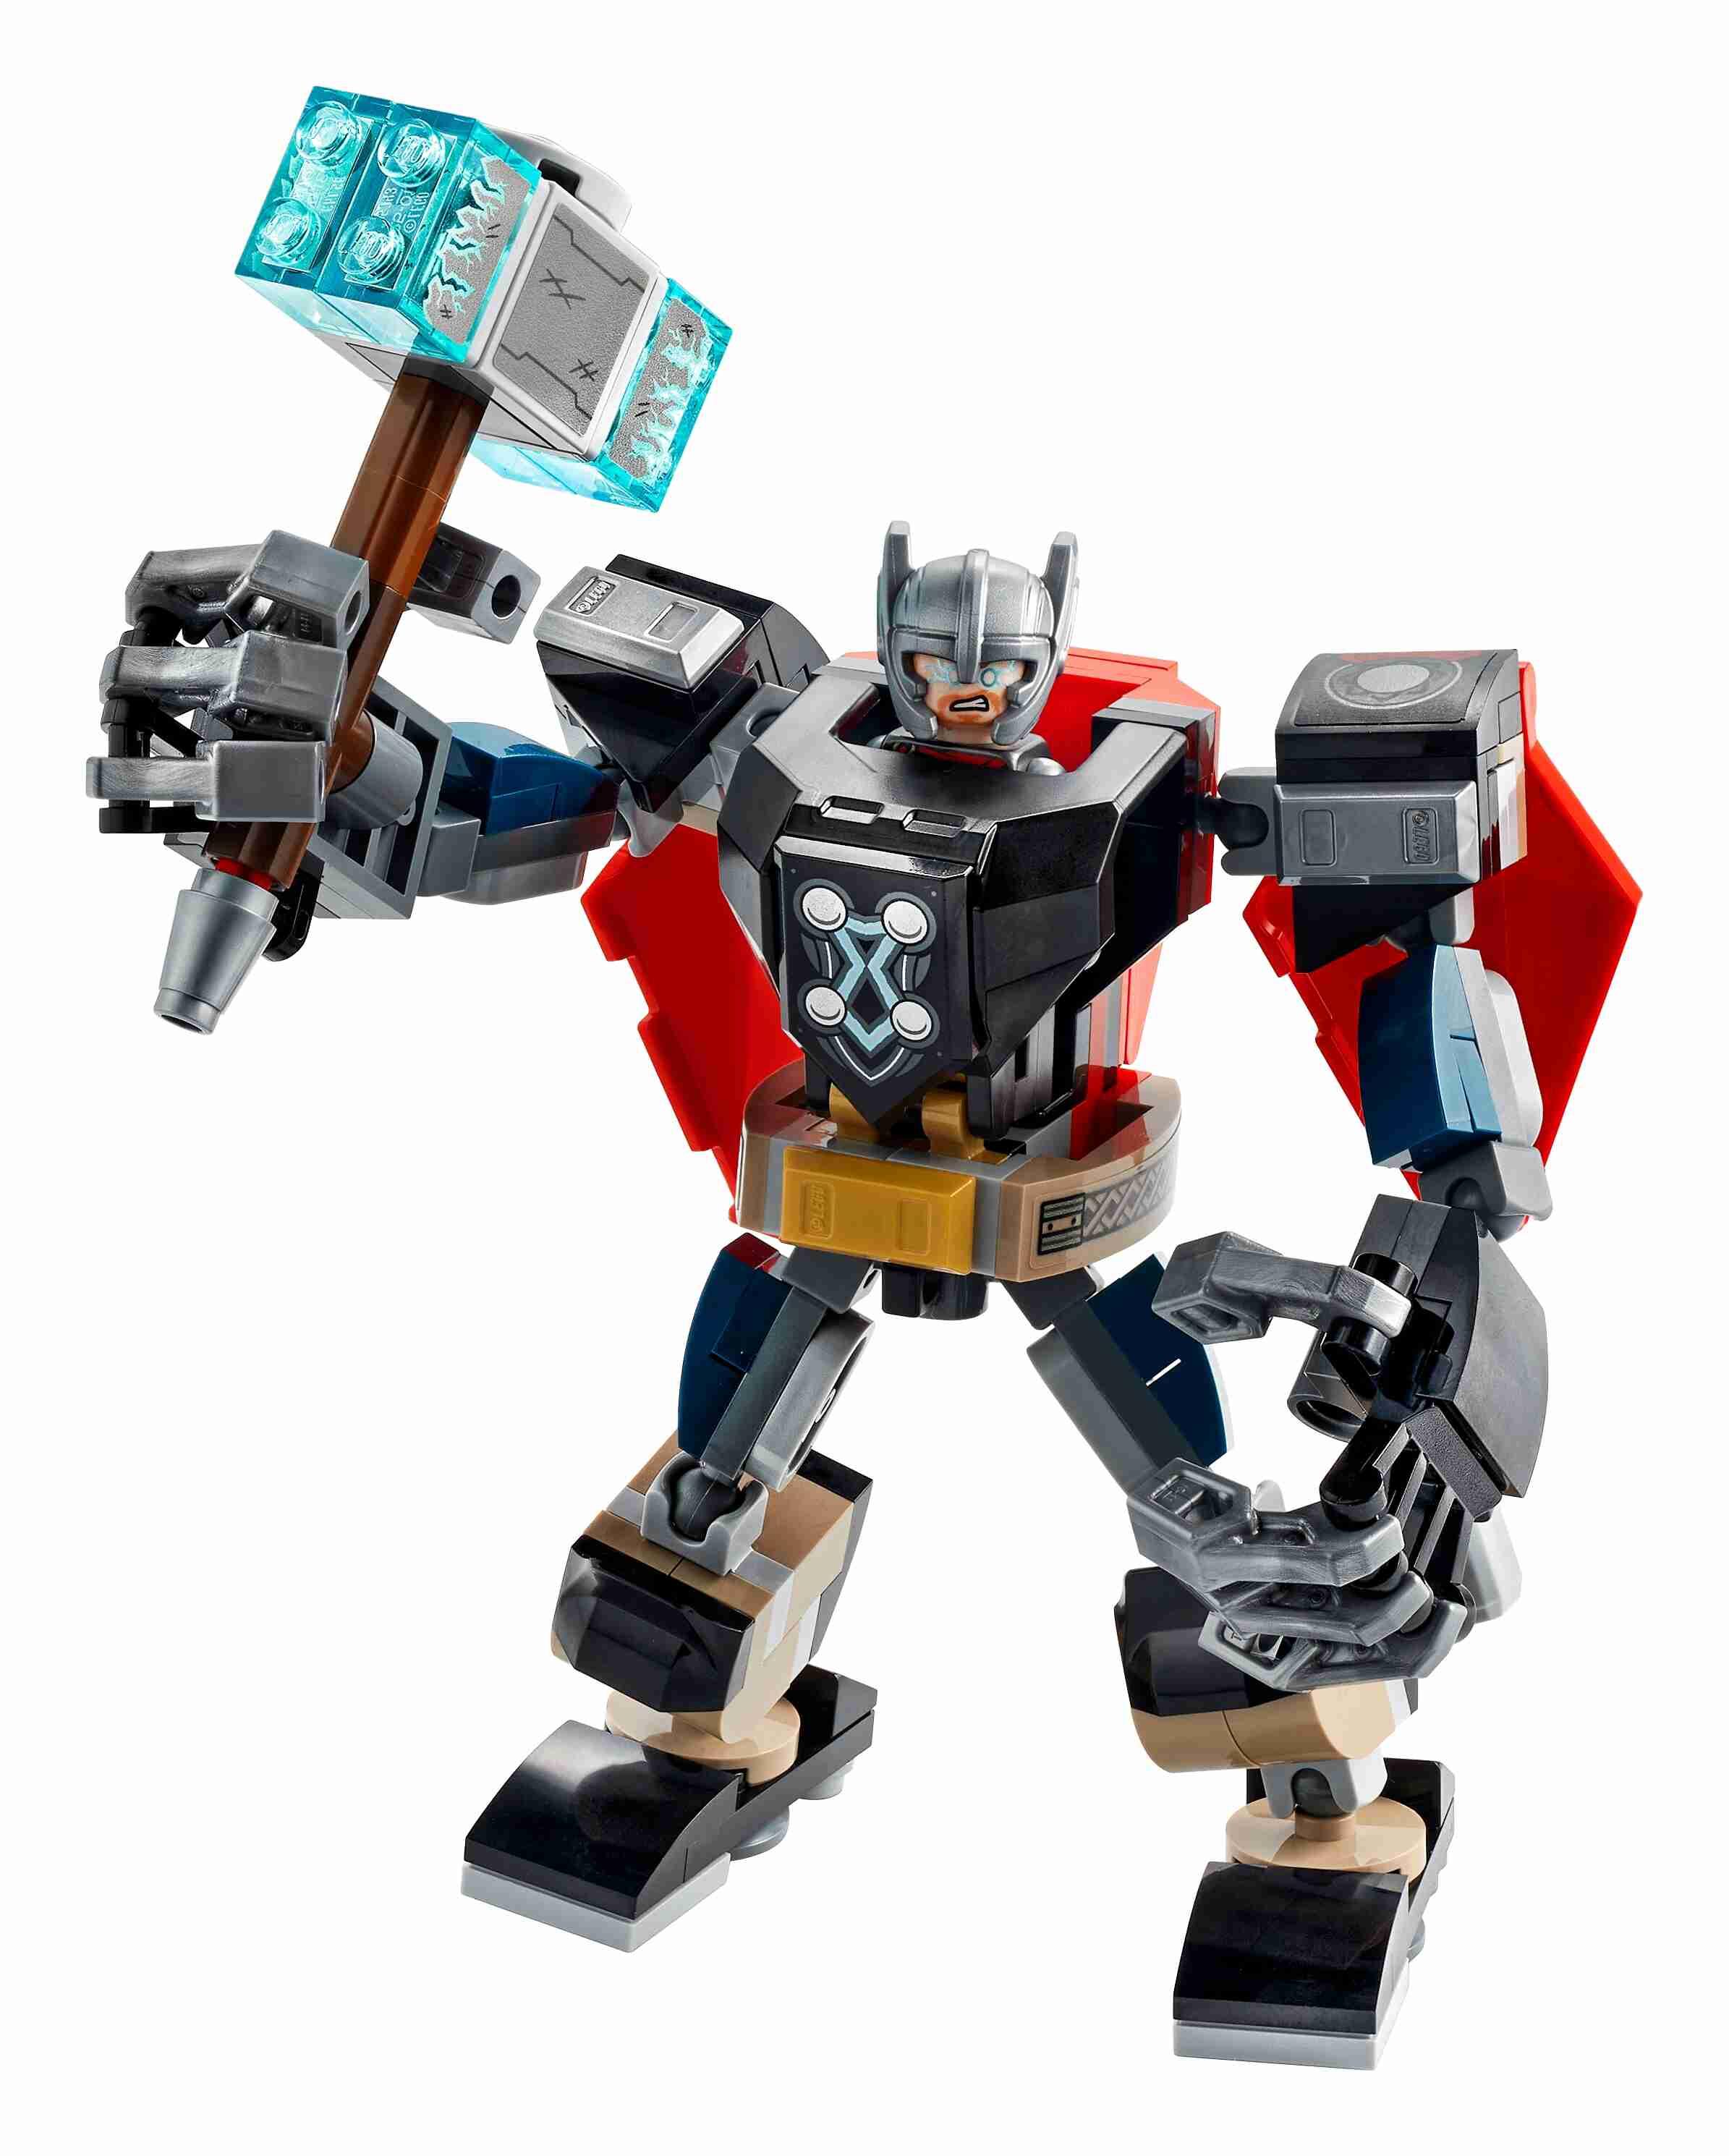 LEGO 76169 Super Heroes Marvel Avengers Thor Mech Set, Actionfigur mit Thor